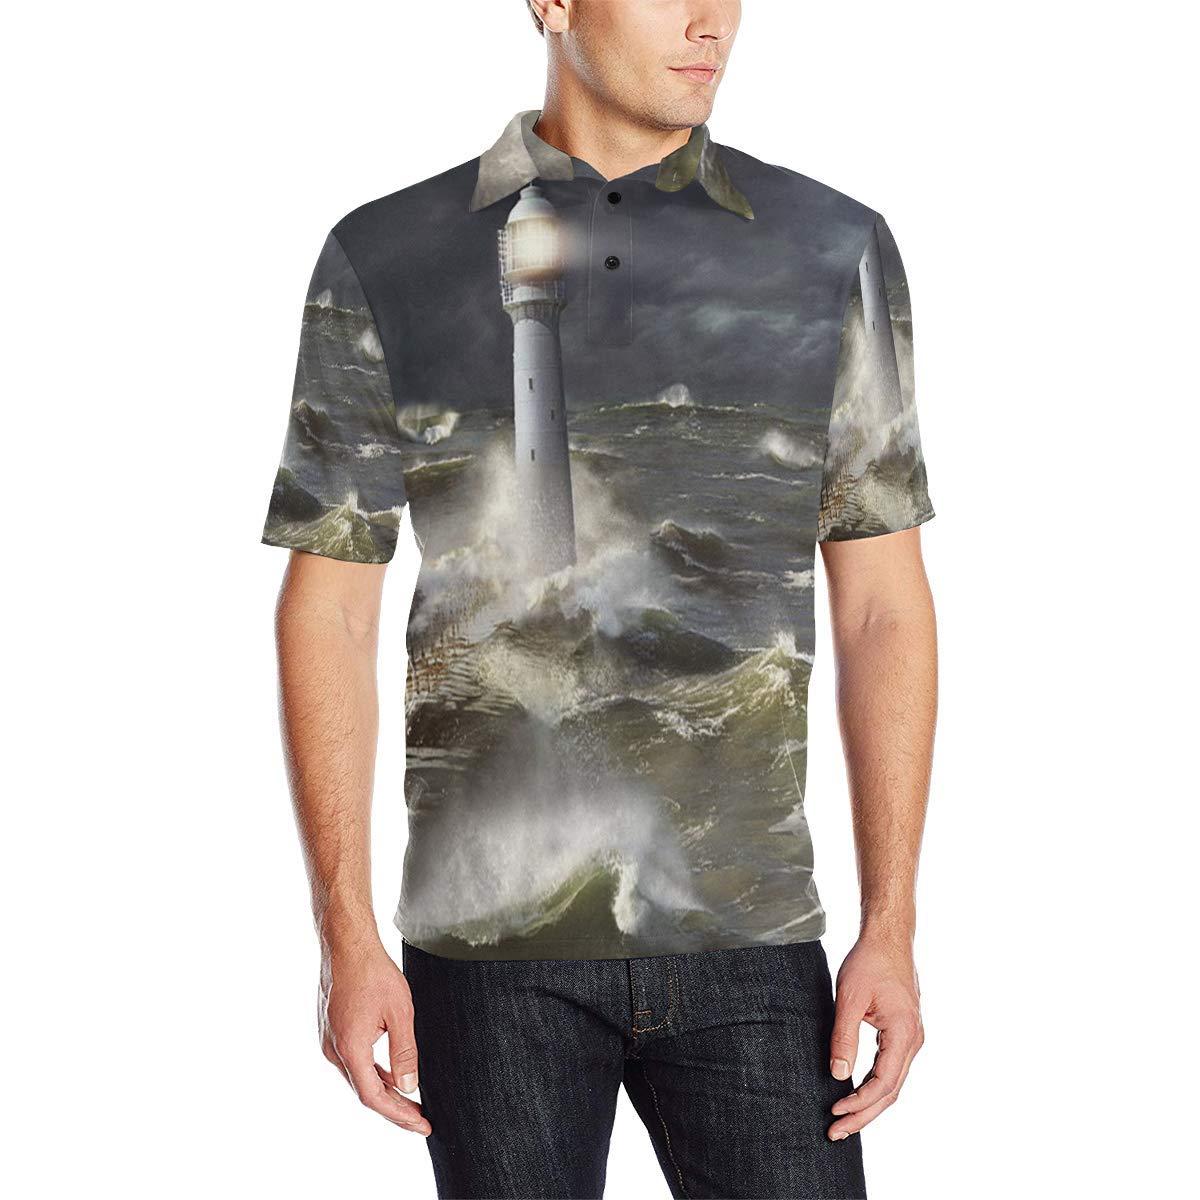 COL DOM Short Sleeve Lighthouse Crashing Waves Mens All Over Print Polo Shirt